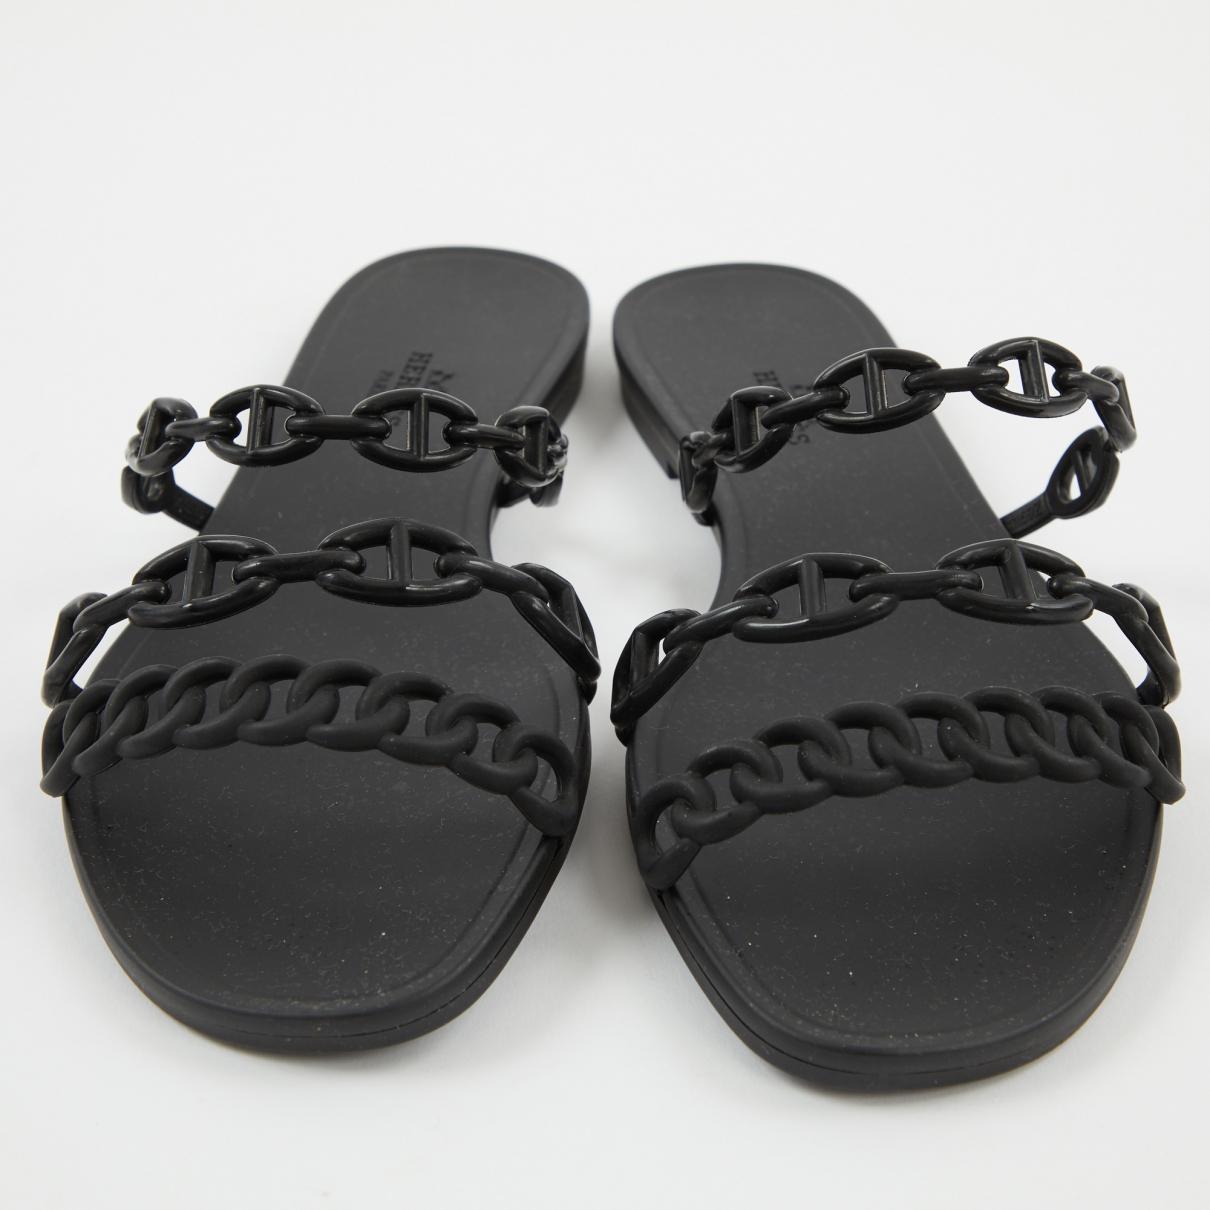 Mules Lyst Black Nude Hermès In Dywehi92 7gbf6y